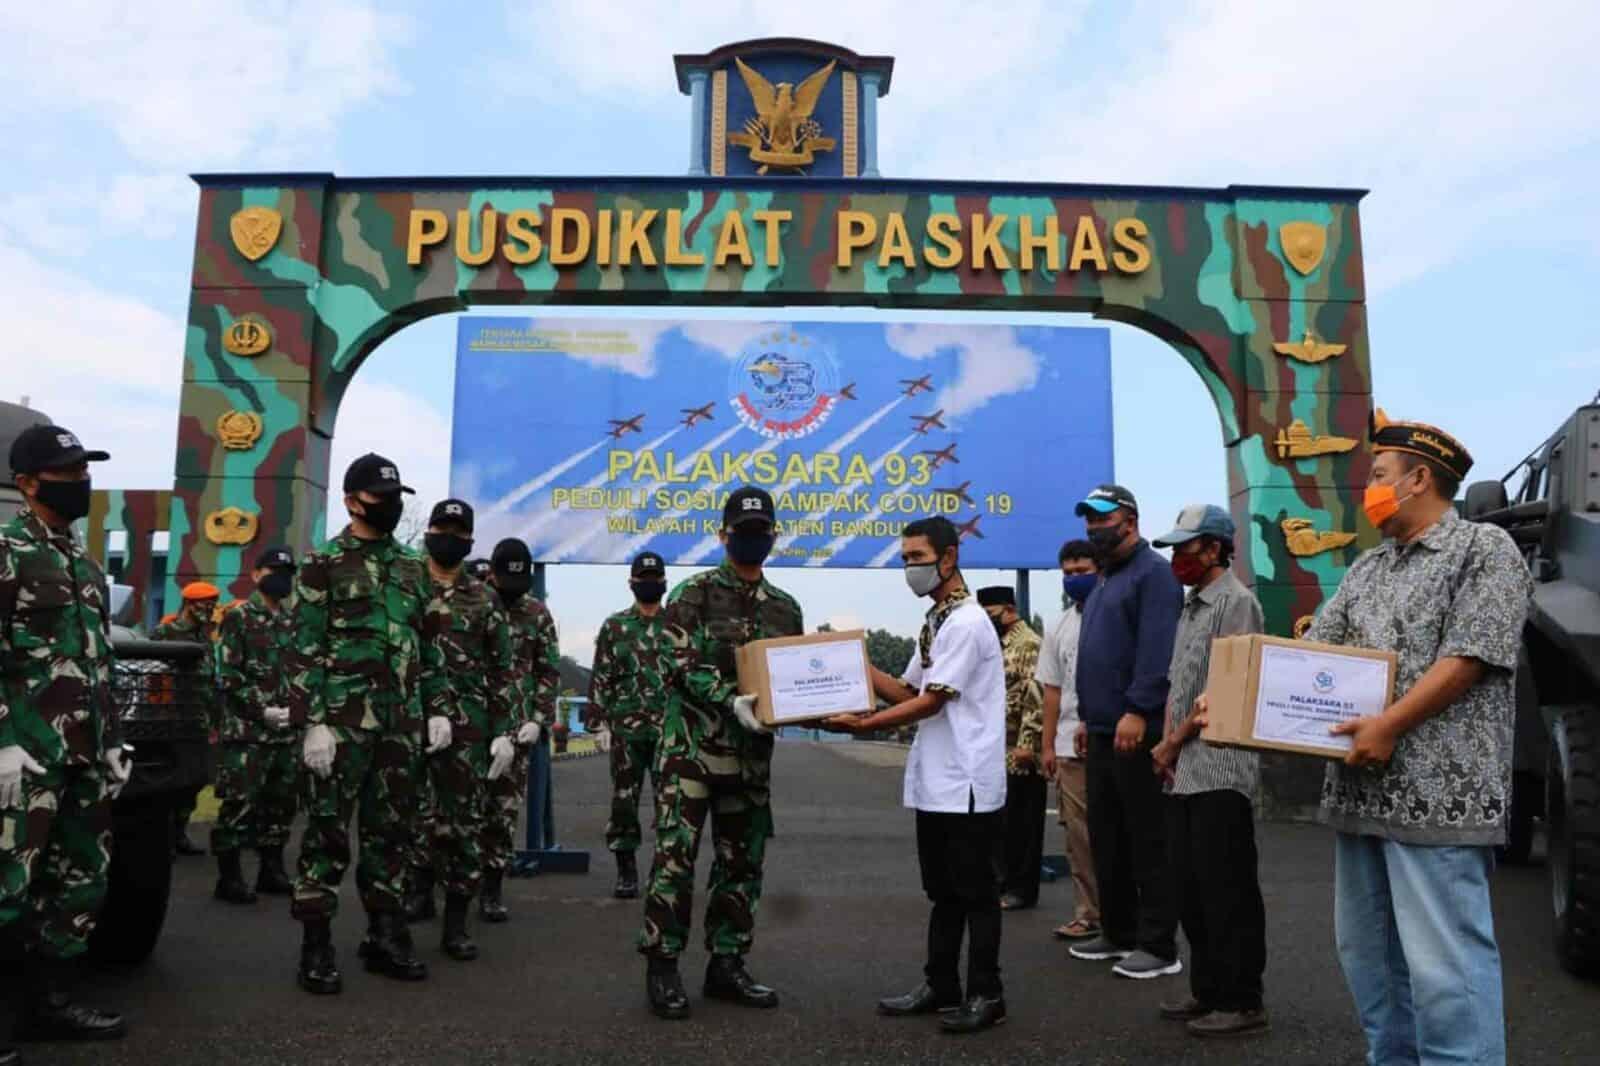 Aksi Peduli Sosial Covid-19 Palaksara AAU 93 Wilayah Bandung